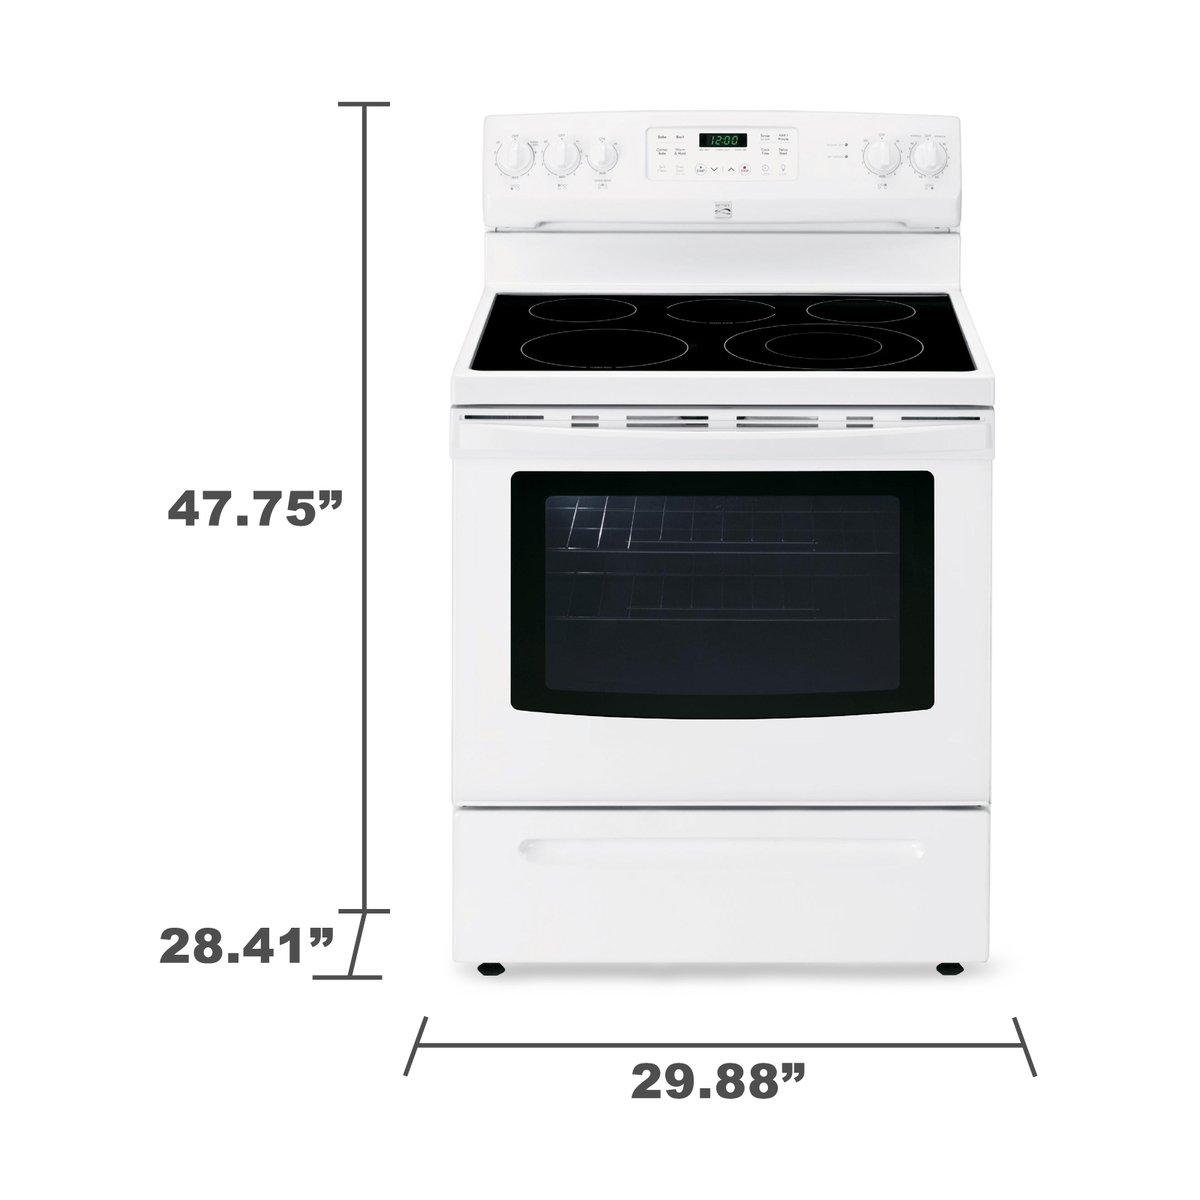 amazon com kenmore 2294199 2294192 02294192 self clean electric rh amazon com Oven Toaster Kenmore 100.8000990A Oven Toaster Kenmore 100.8000990A